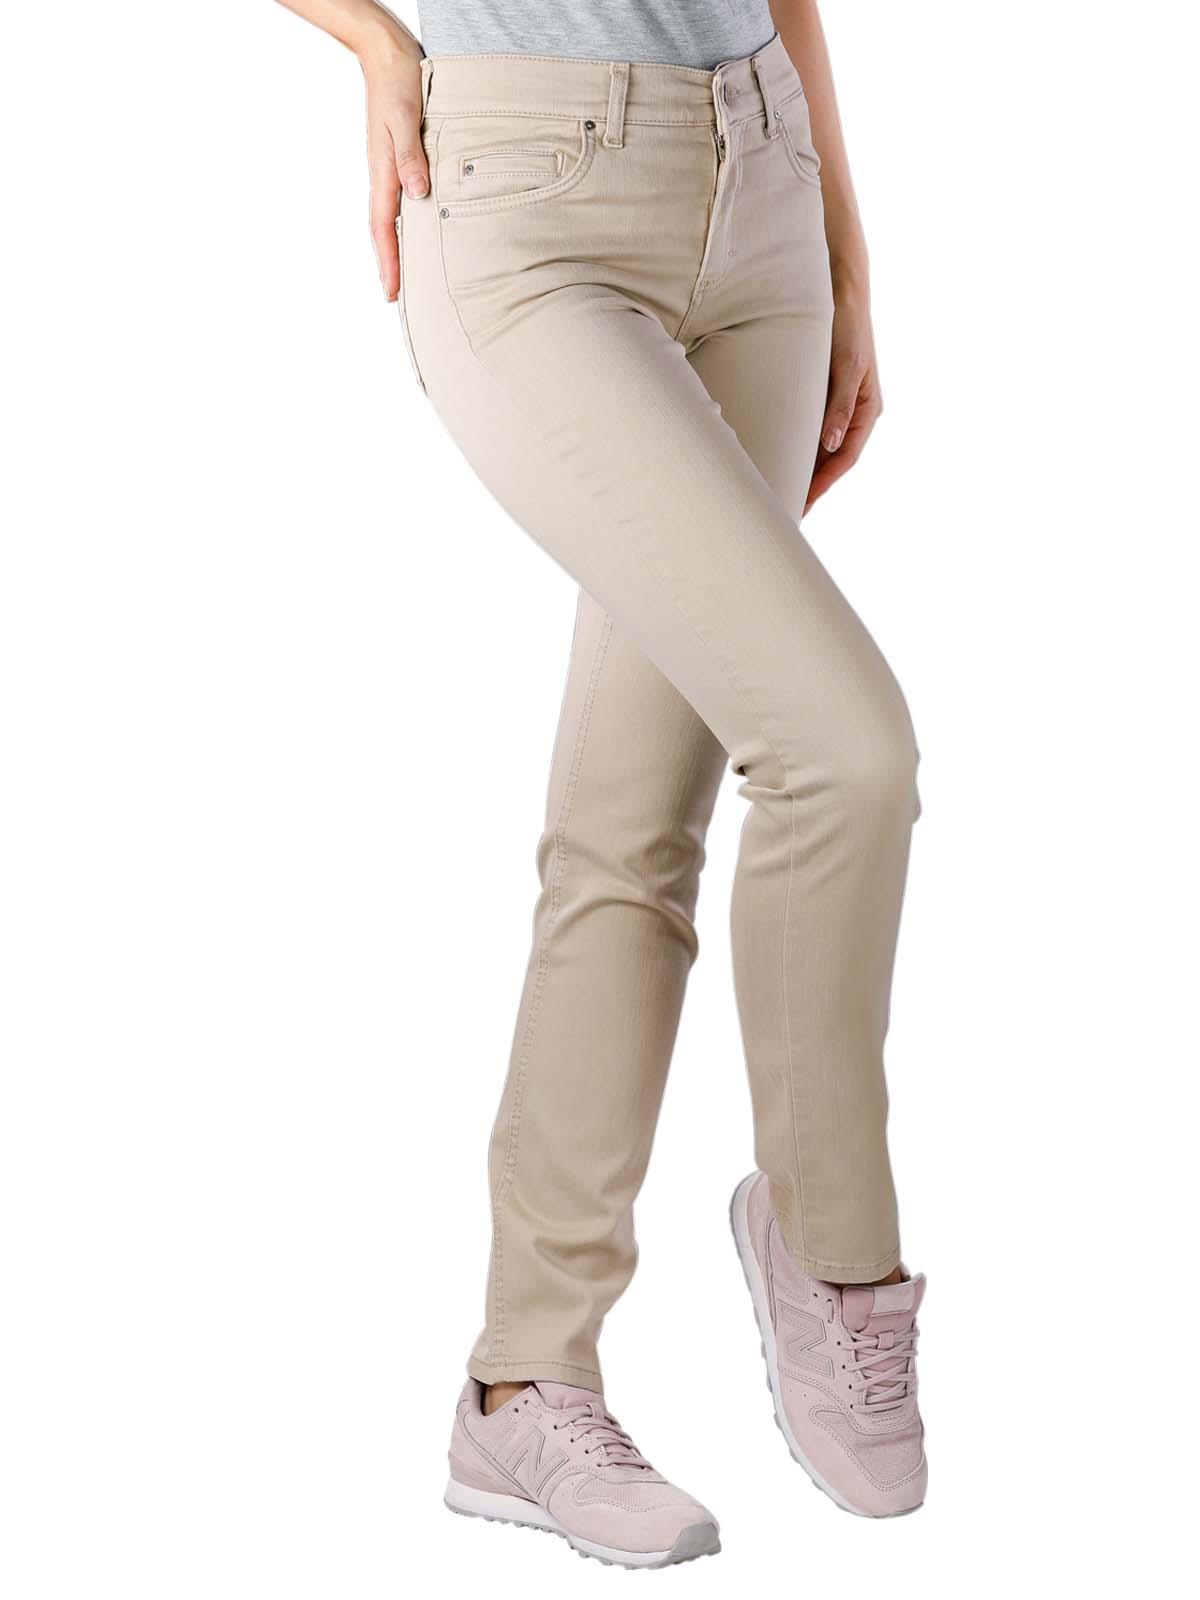 Angels Damen Jeans Cici soft beige